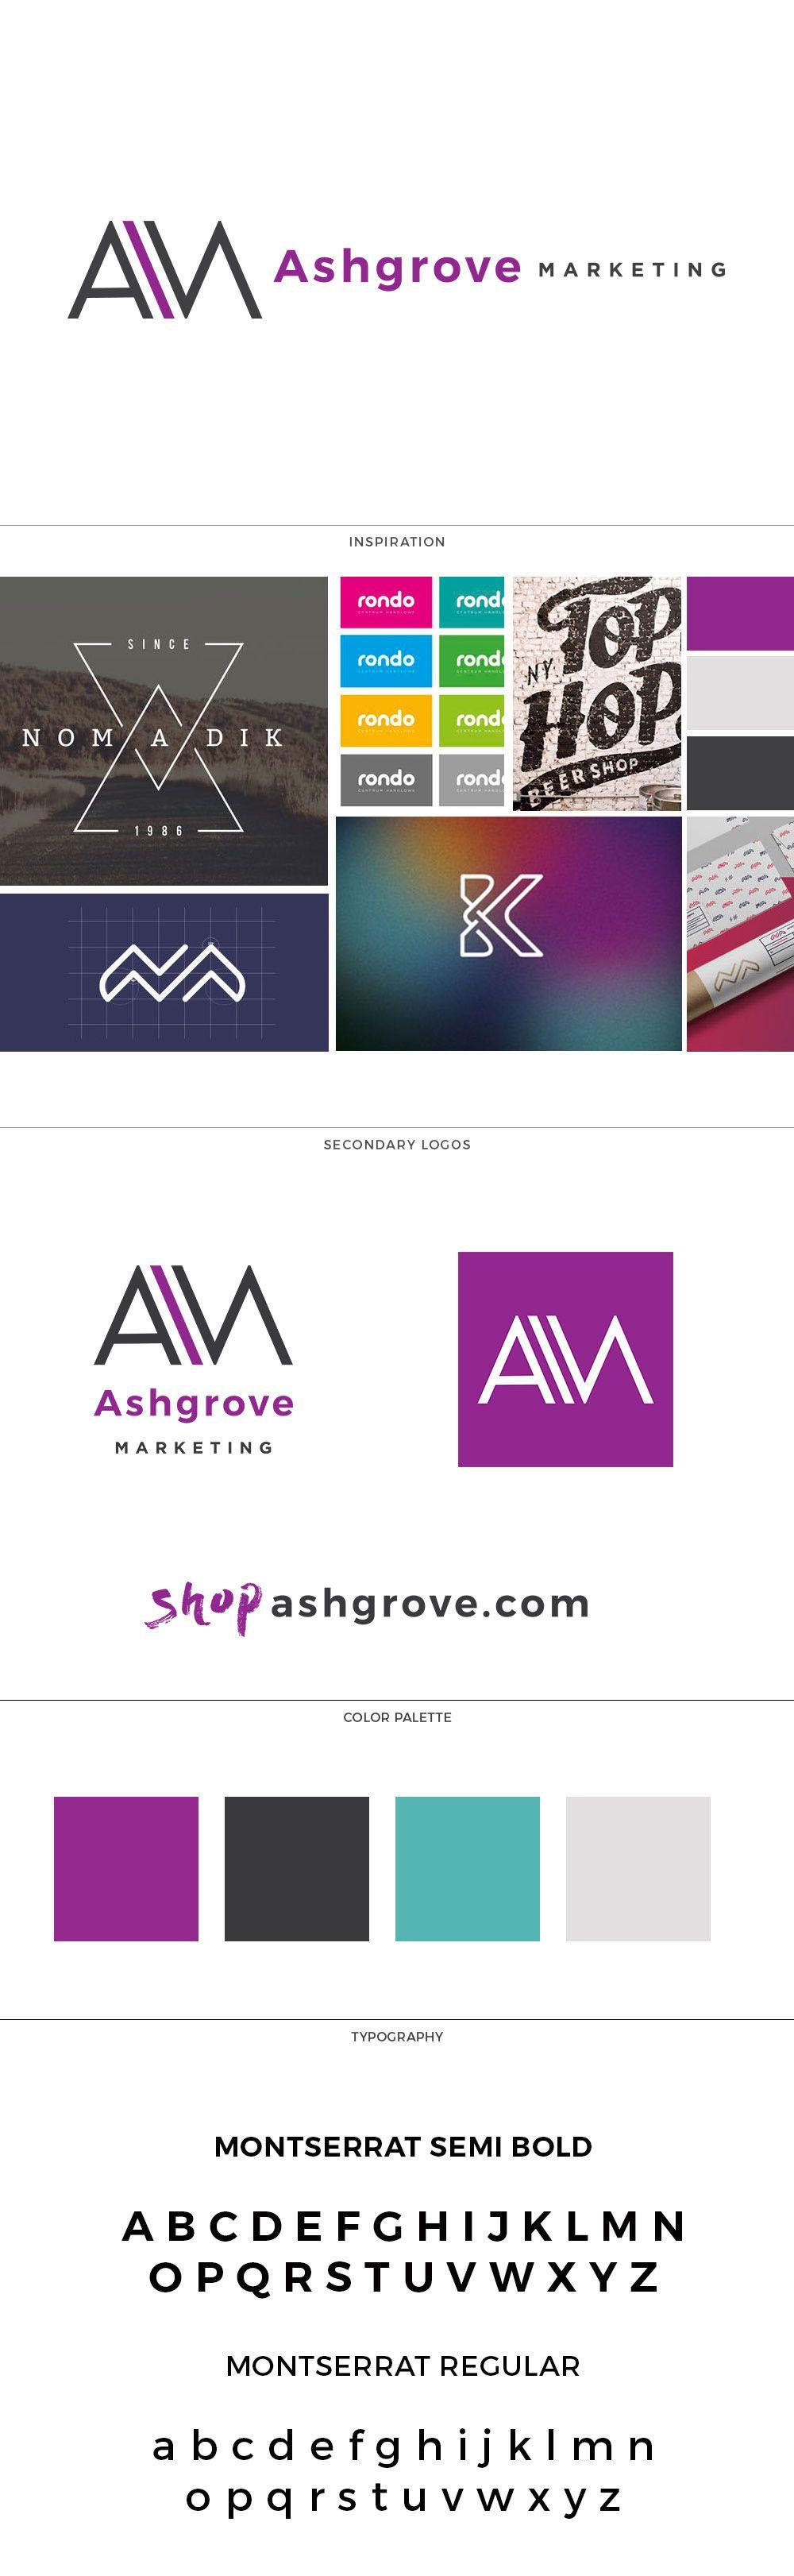 Marketing Agency Brand Website Design In 2020 Website Branding Branding Website Design Company Logo Design